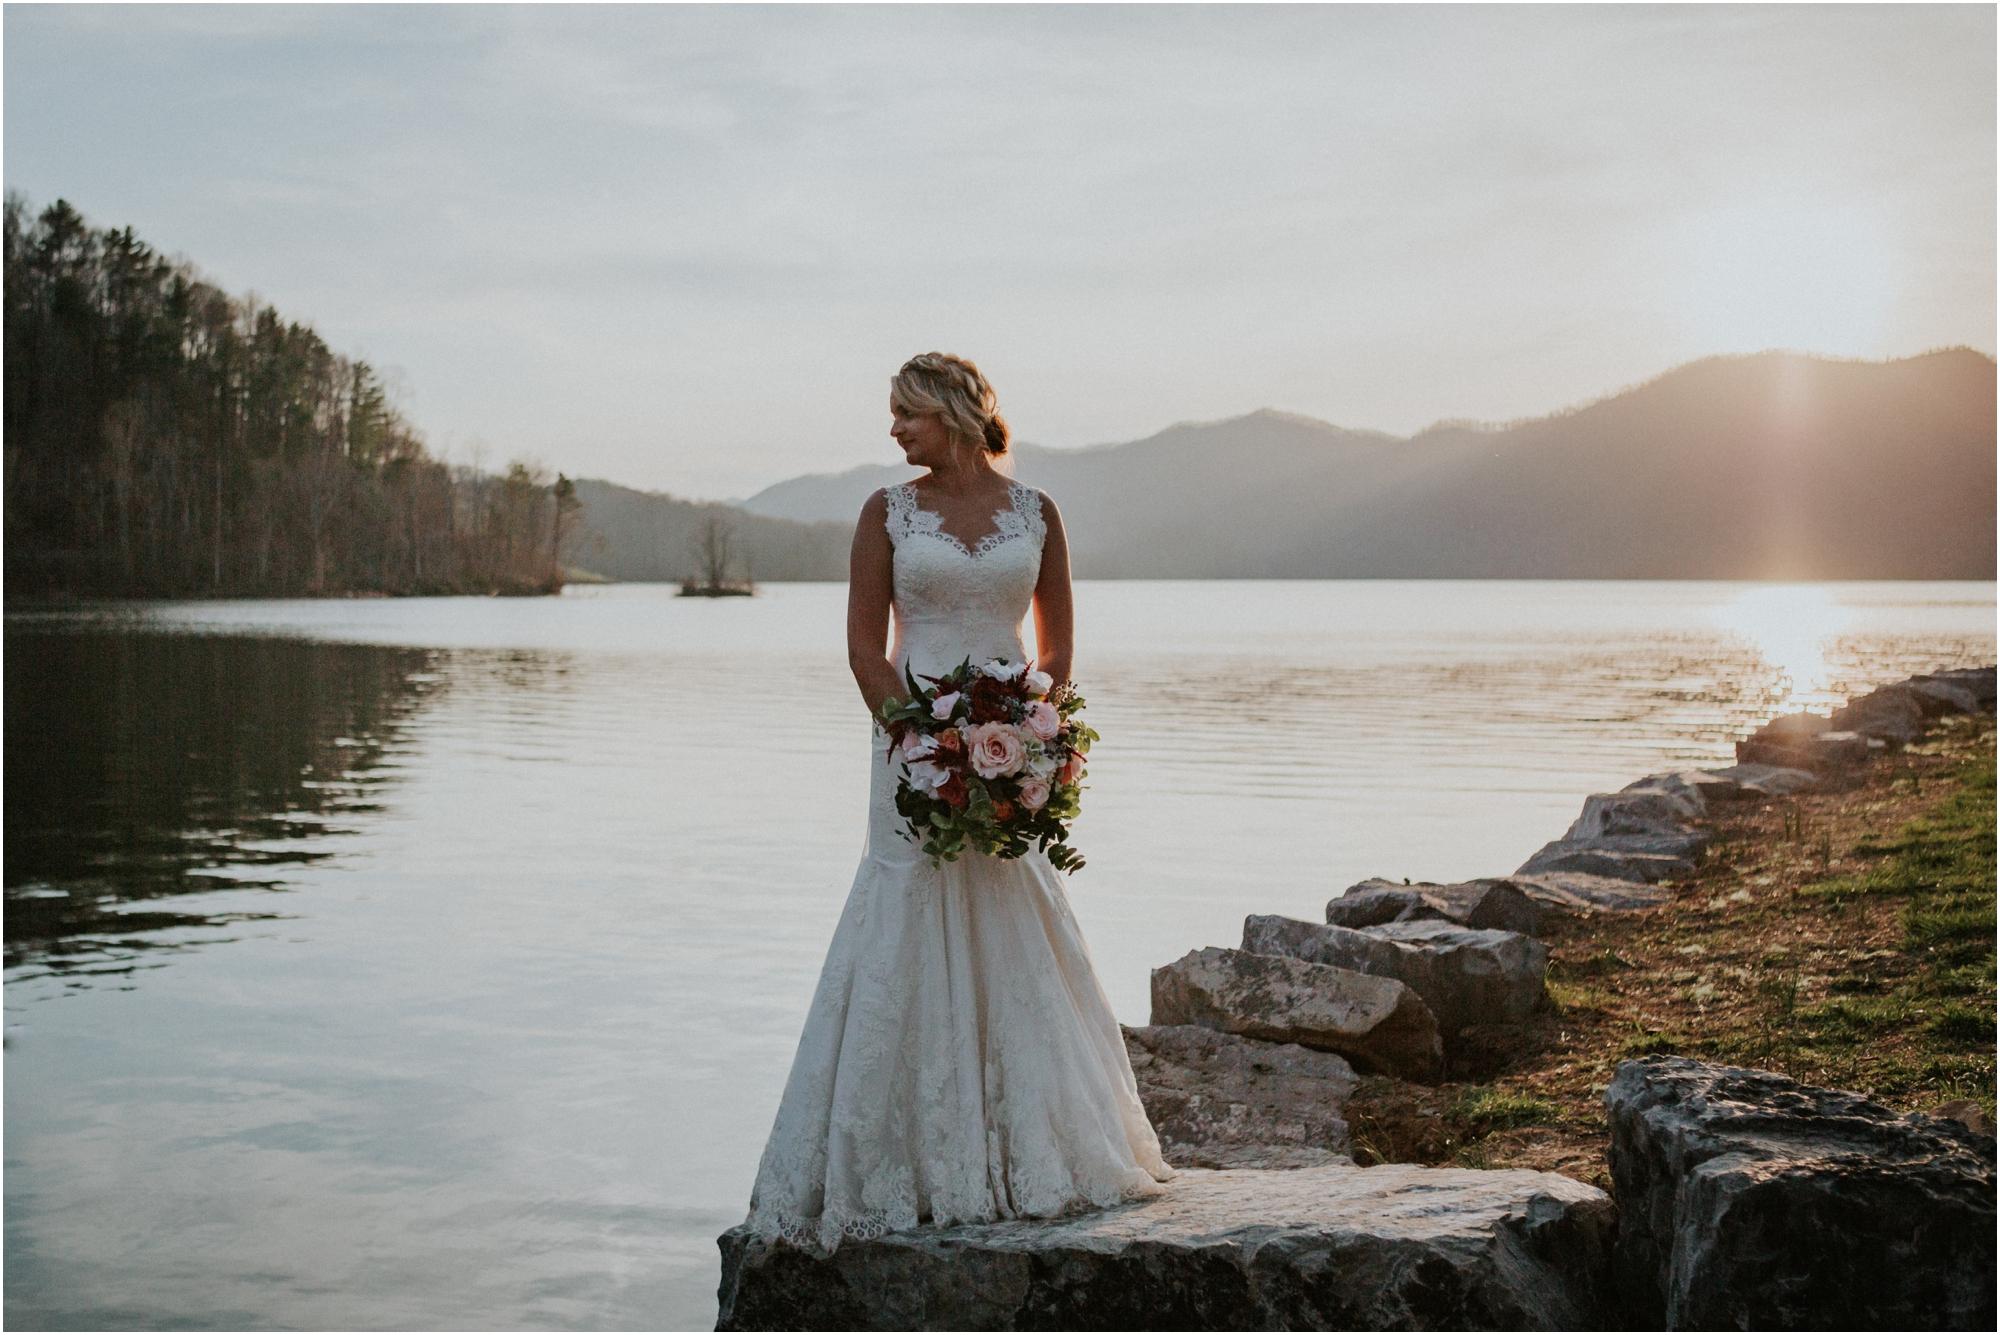 watauga-lake--bohemian-bridal-styled-session-northeast-tennessee-wedding-elopement-photography_0010.jpg